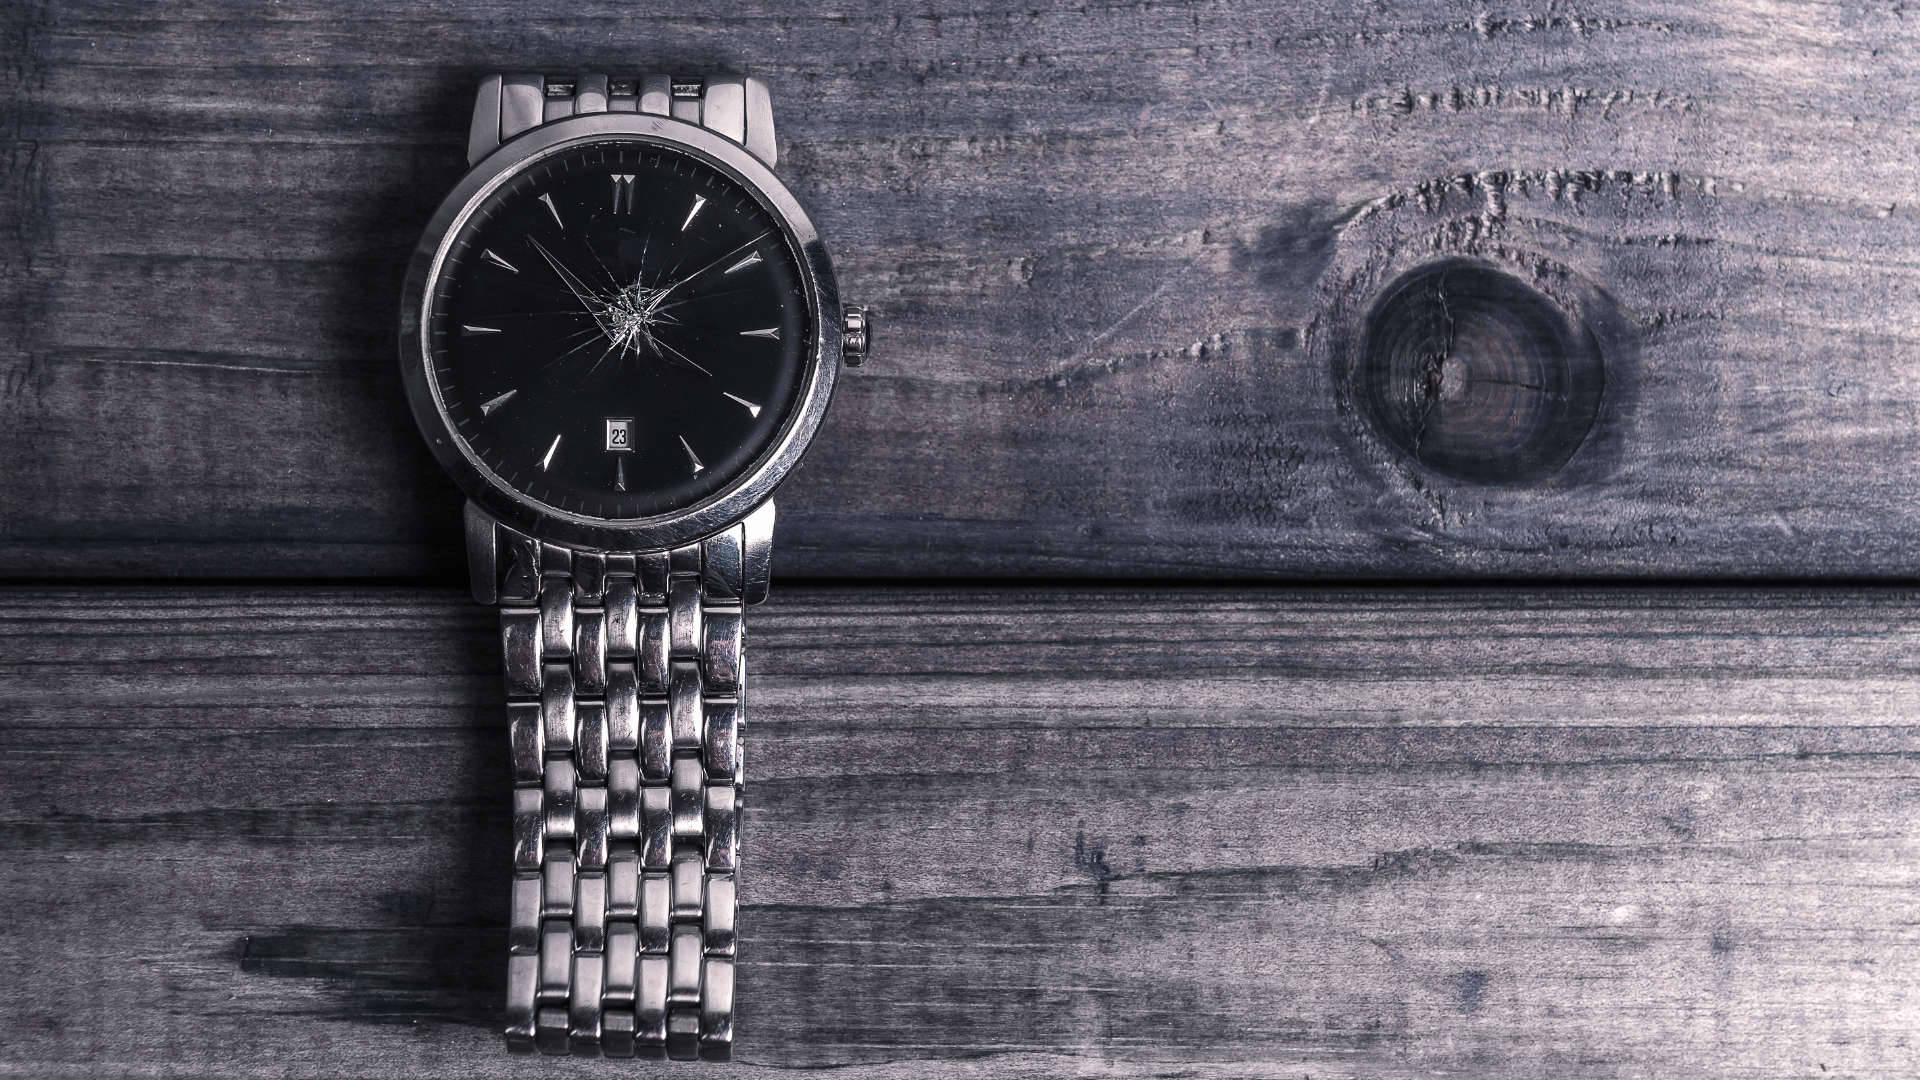 Broken watch glass needing replaced for customer in East Kilbride